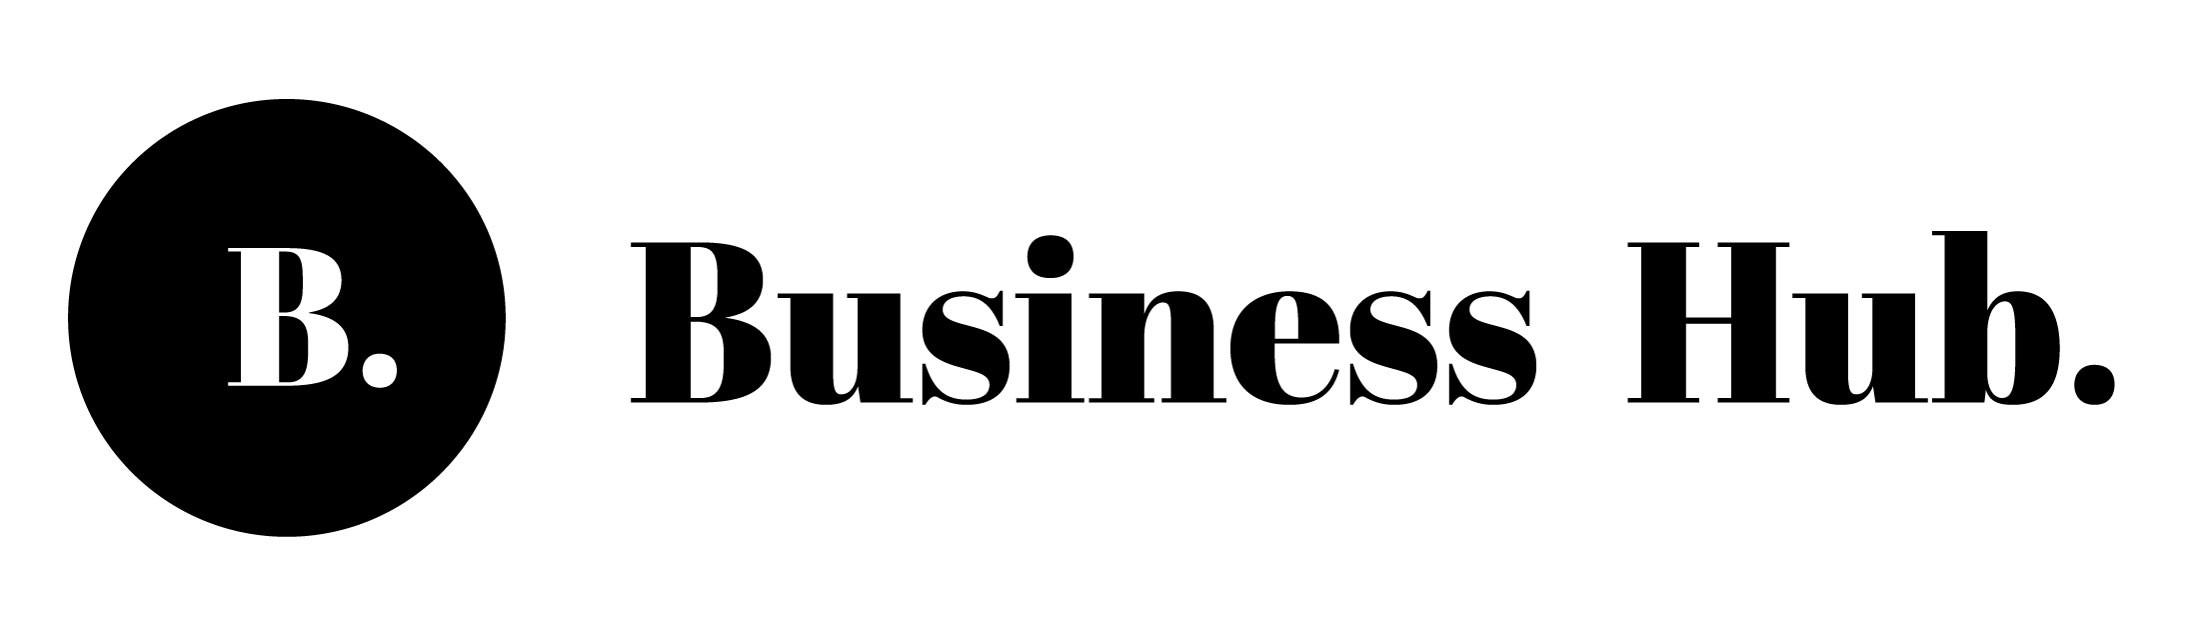 Business Hub.